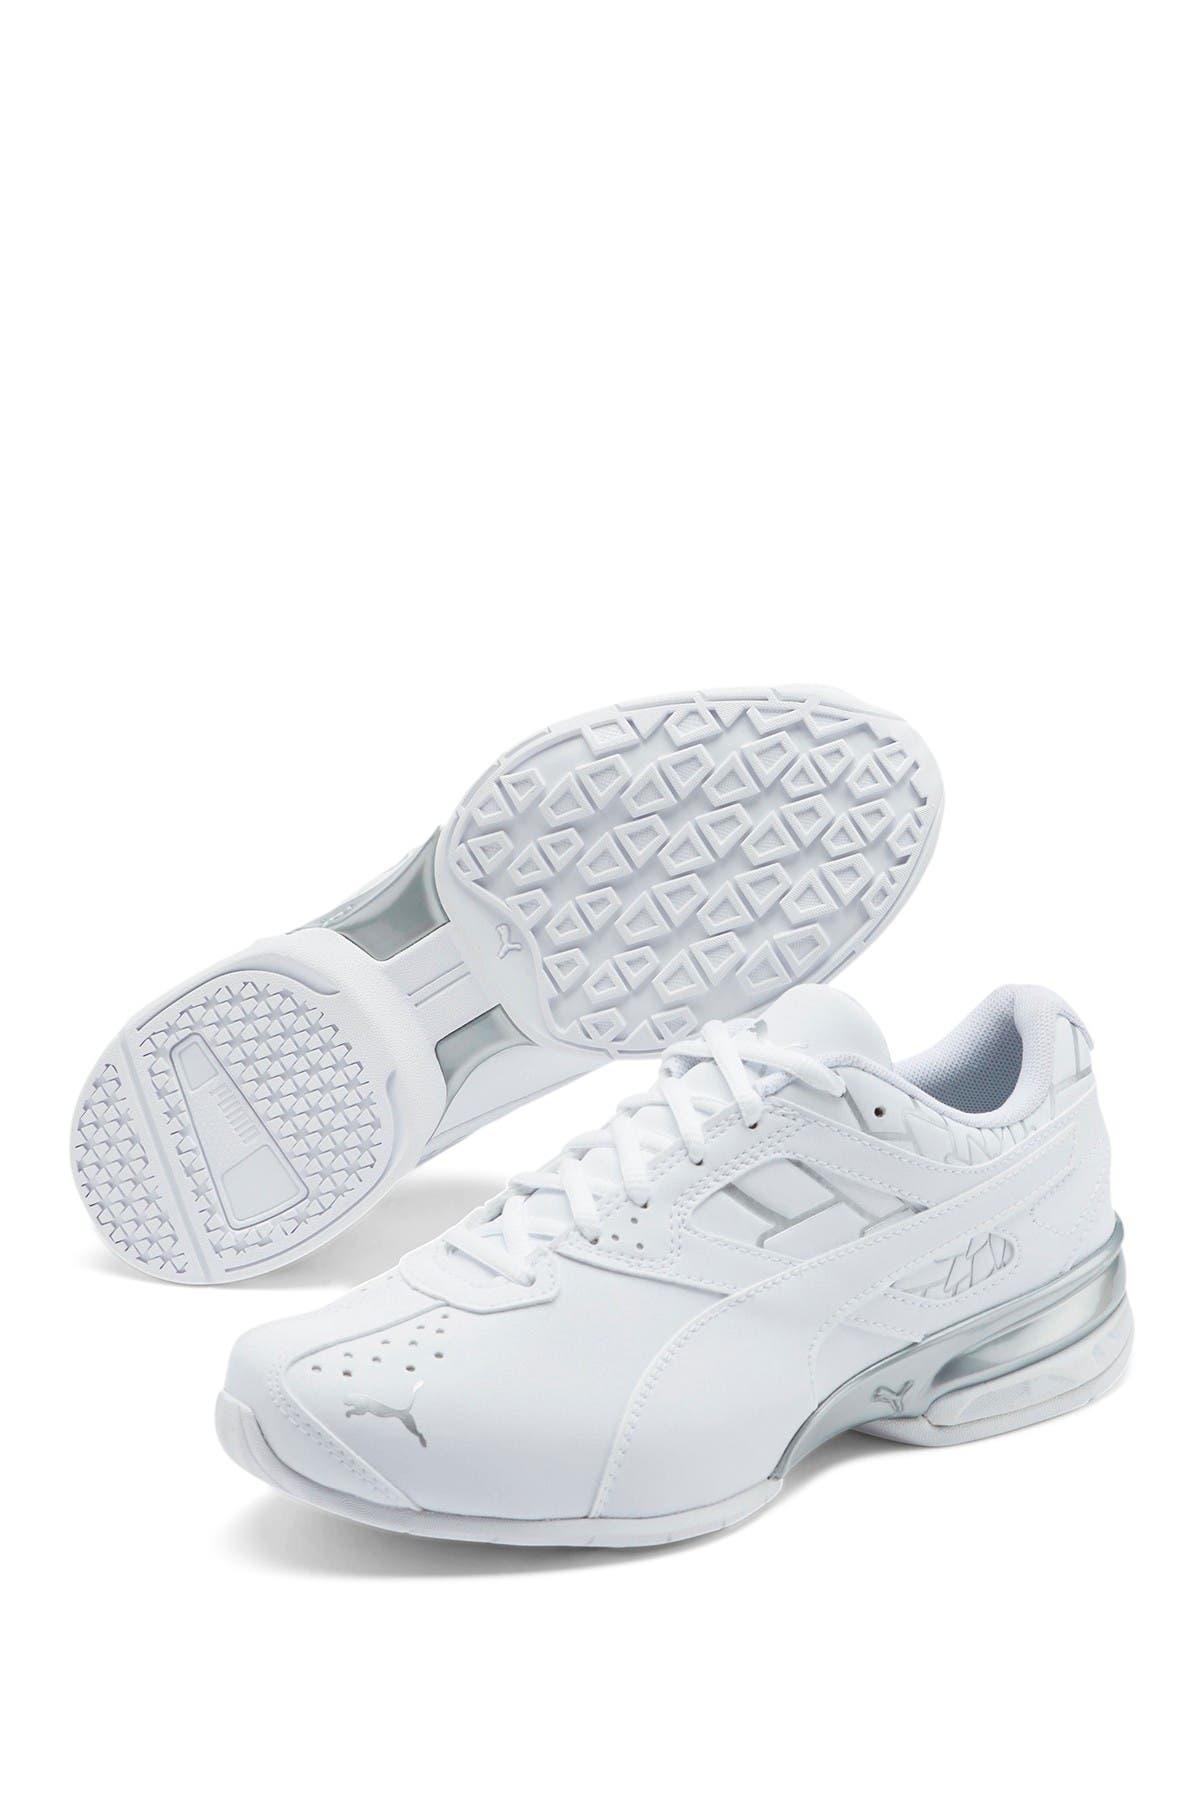 Image of PUMA Tazon 6 Training Sneaker